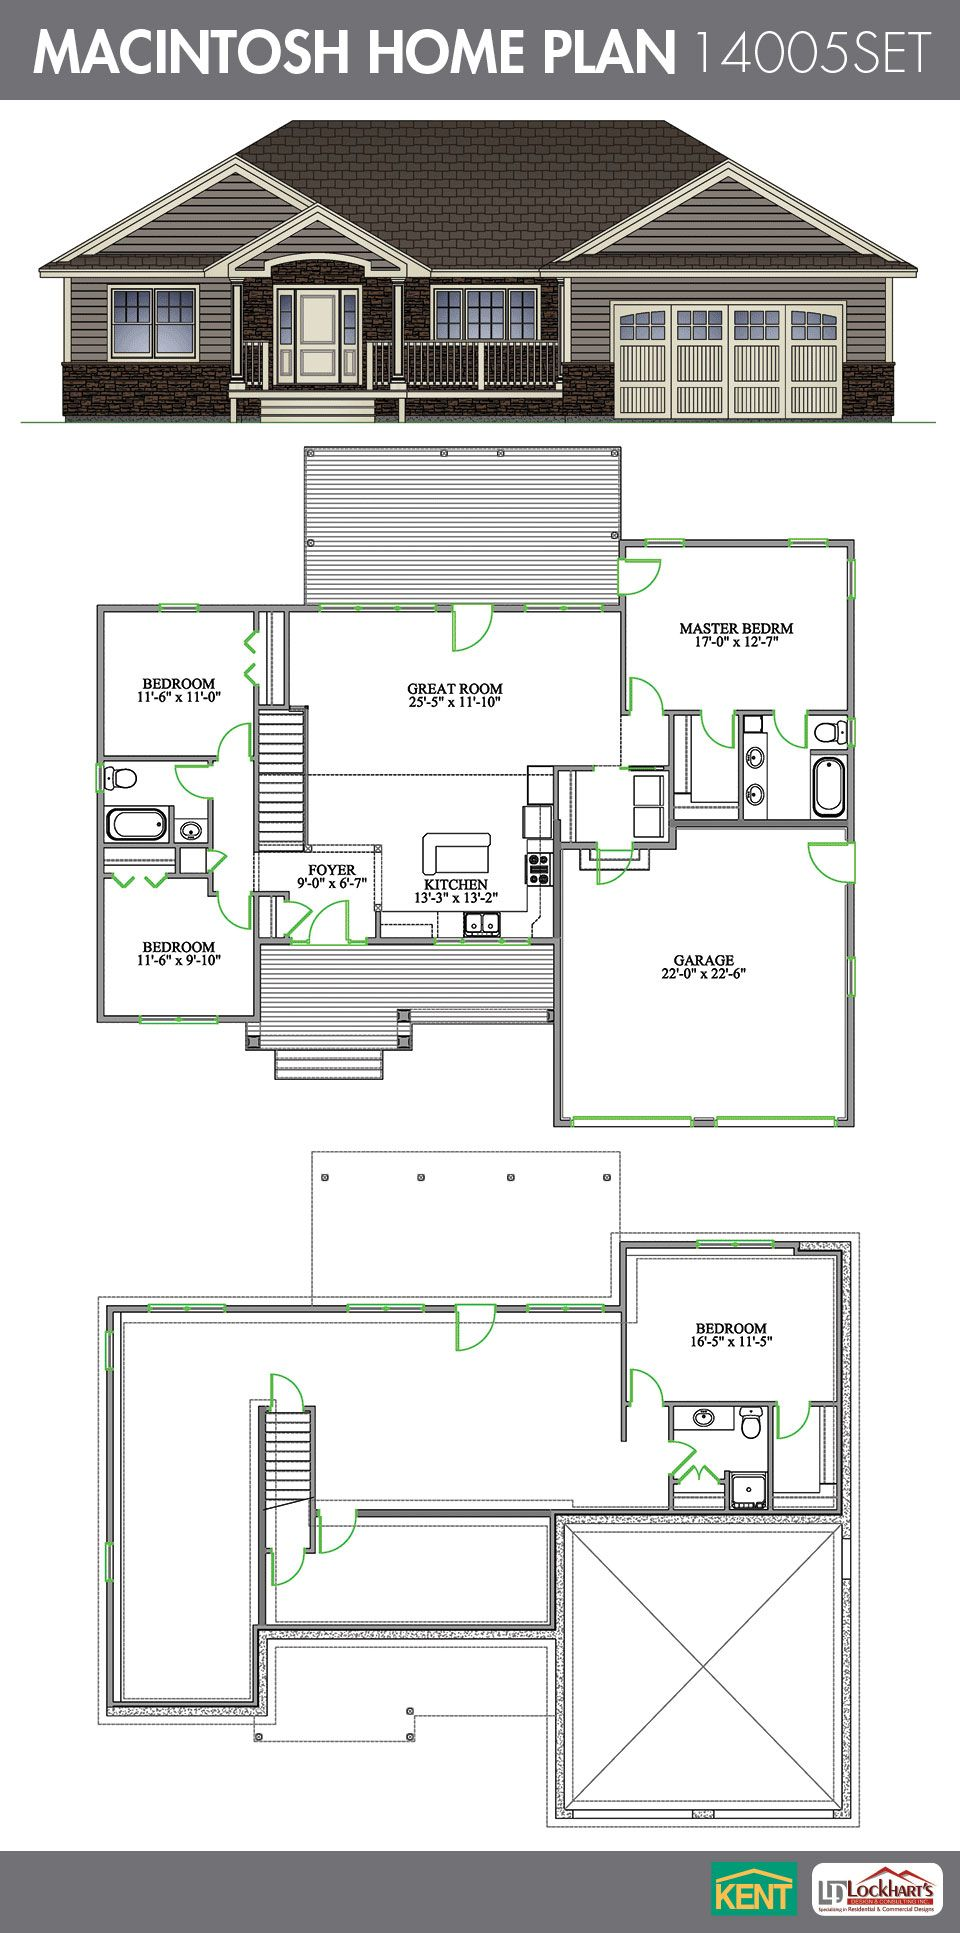 macintosh 4 bedroom 3 bath 1486 sq ft home plan features macintosh 4 bedroom 3 bath 1486 sq ft home plan features